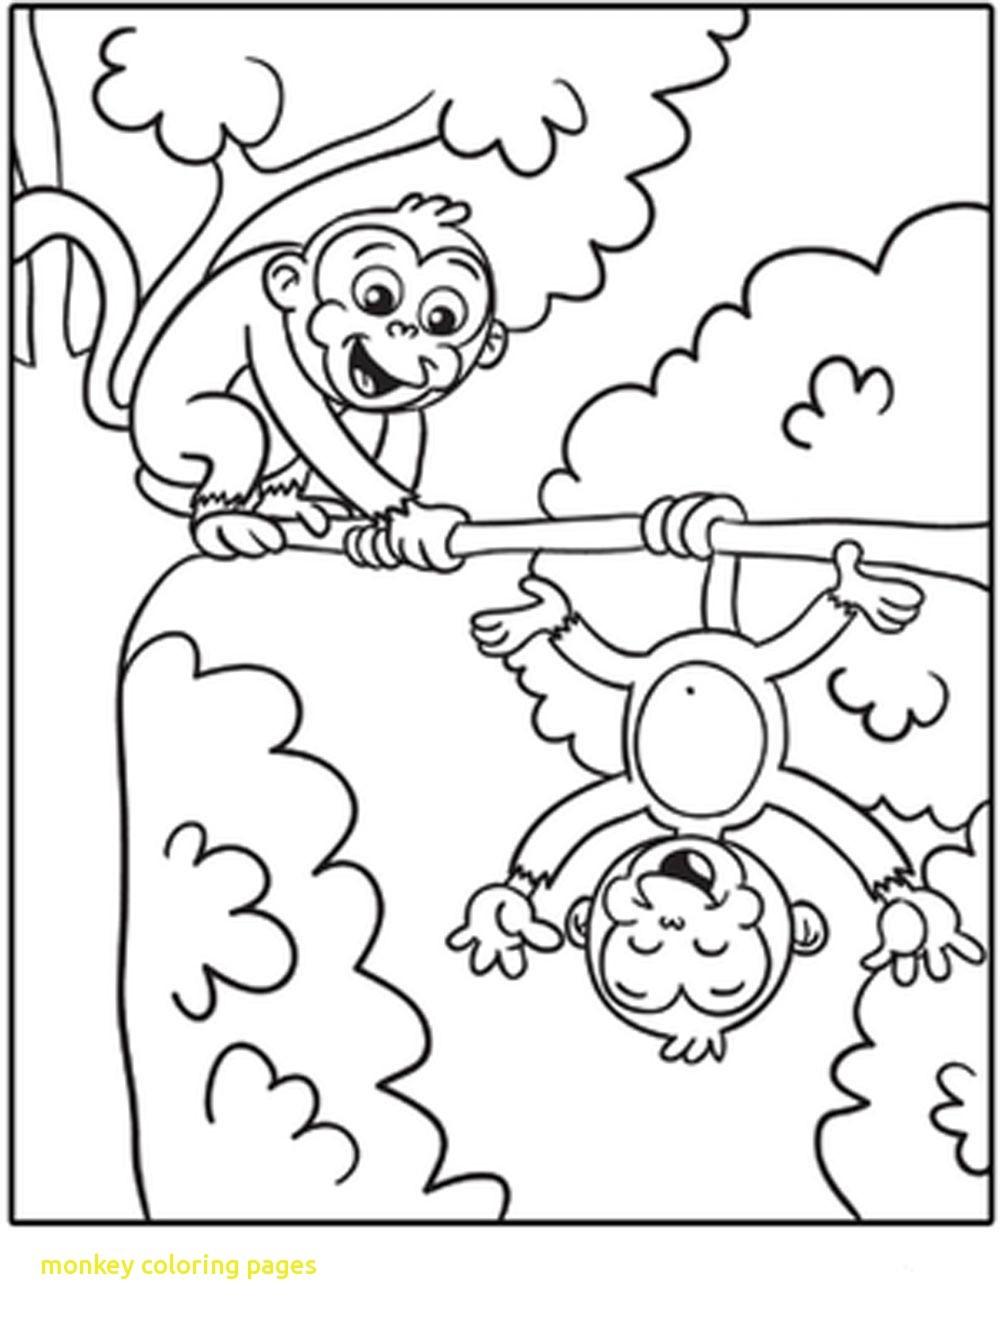 1000x1322 Tremendous Monkey Coloring Pages Free Printable Page Cj